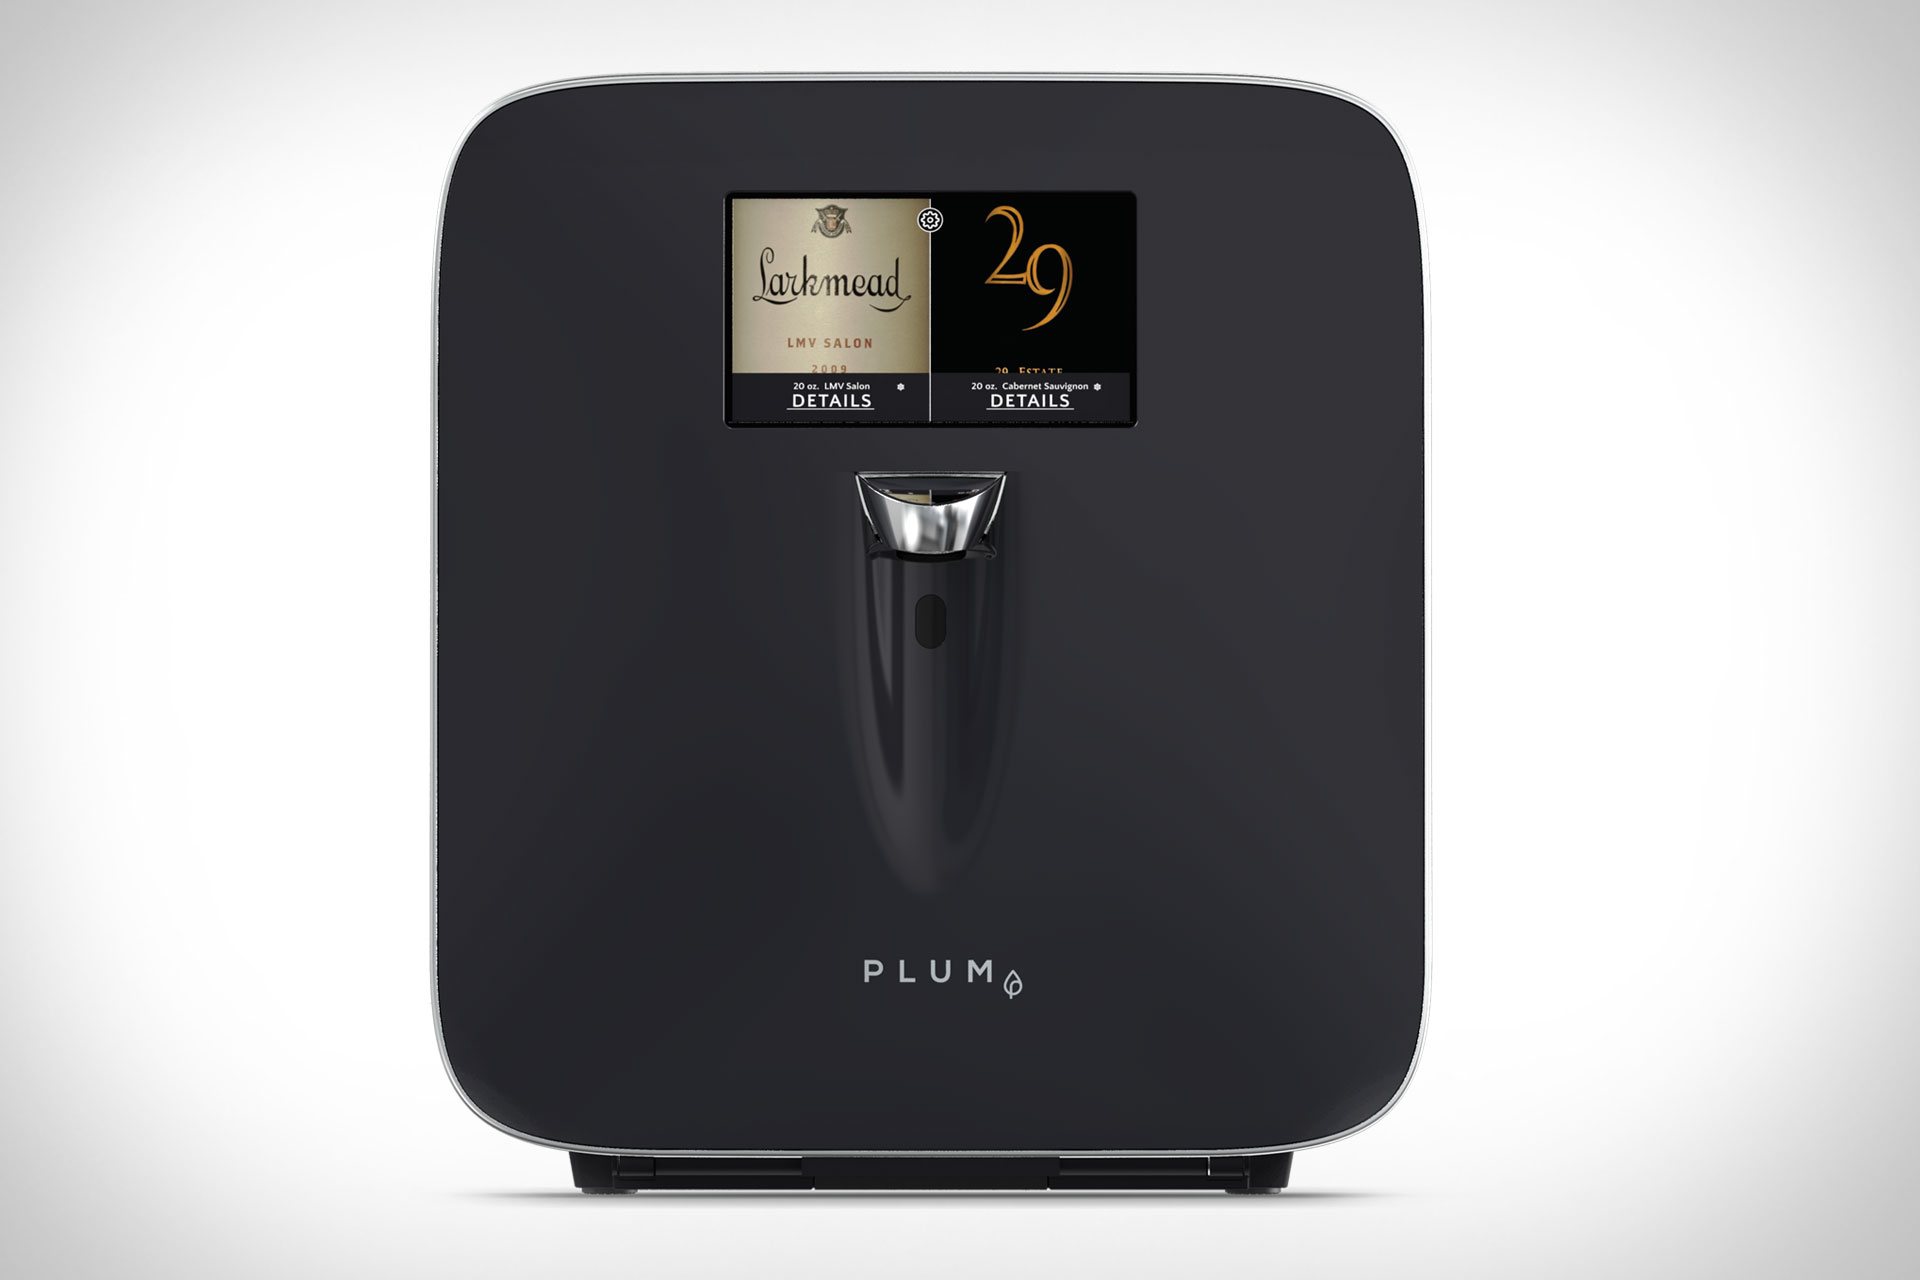 Plum Wine Preserver